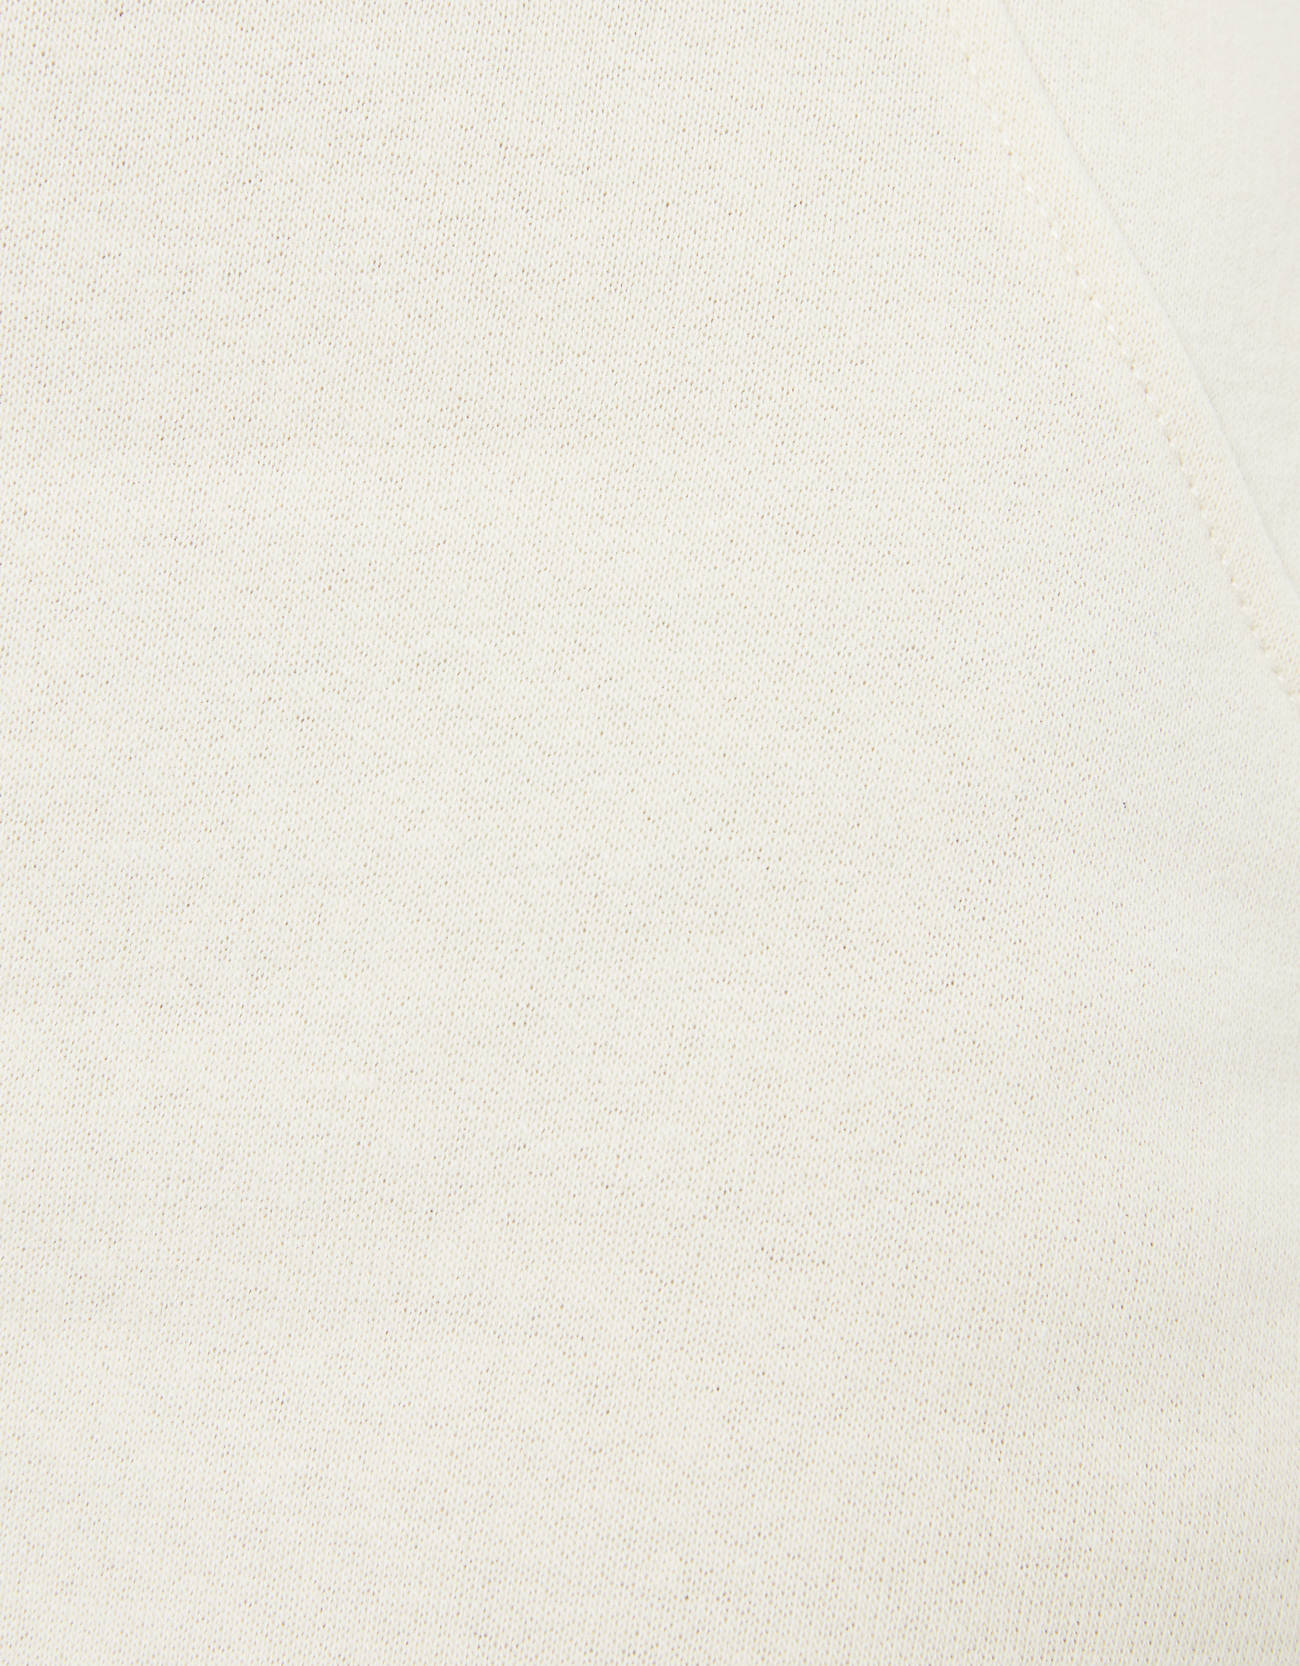 Юбка из мягкой ткани Бежевый Bershka